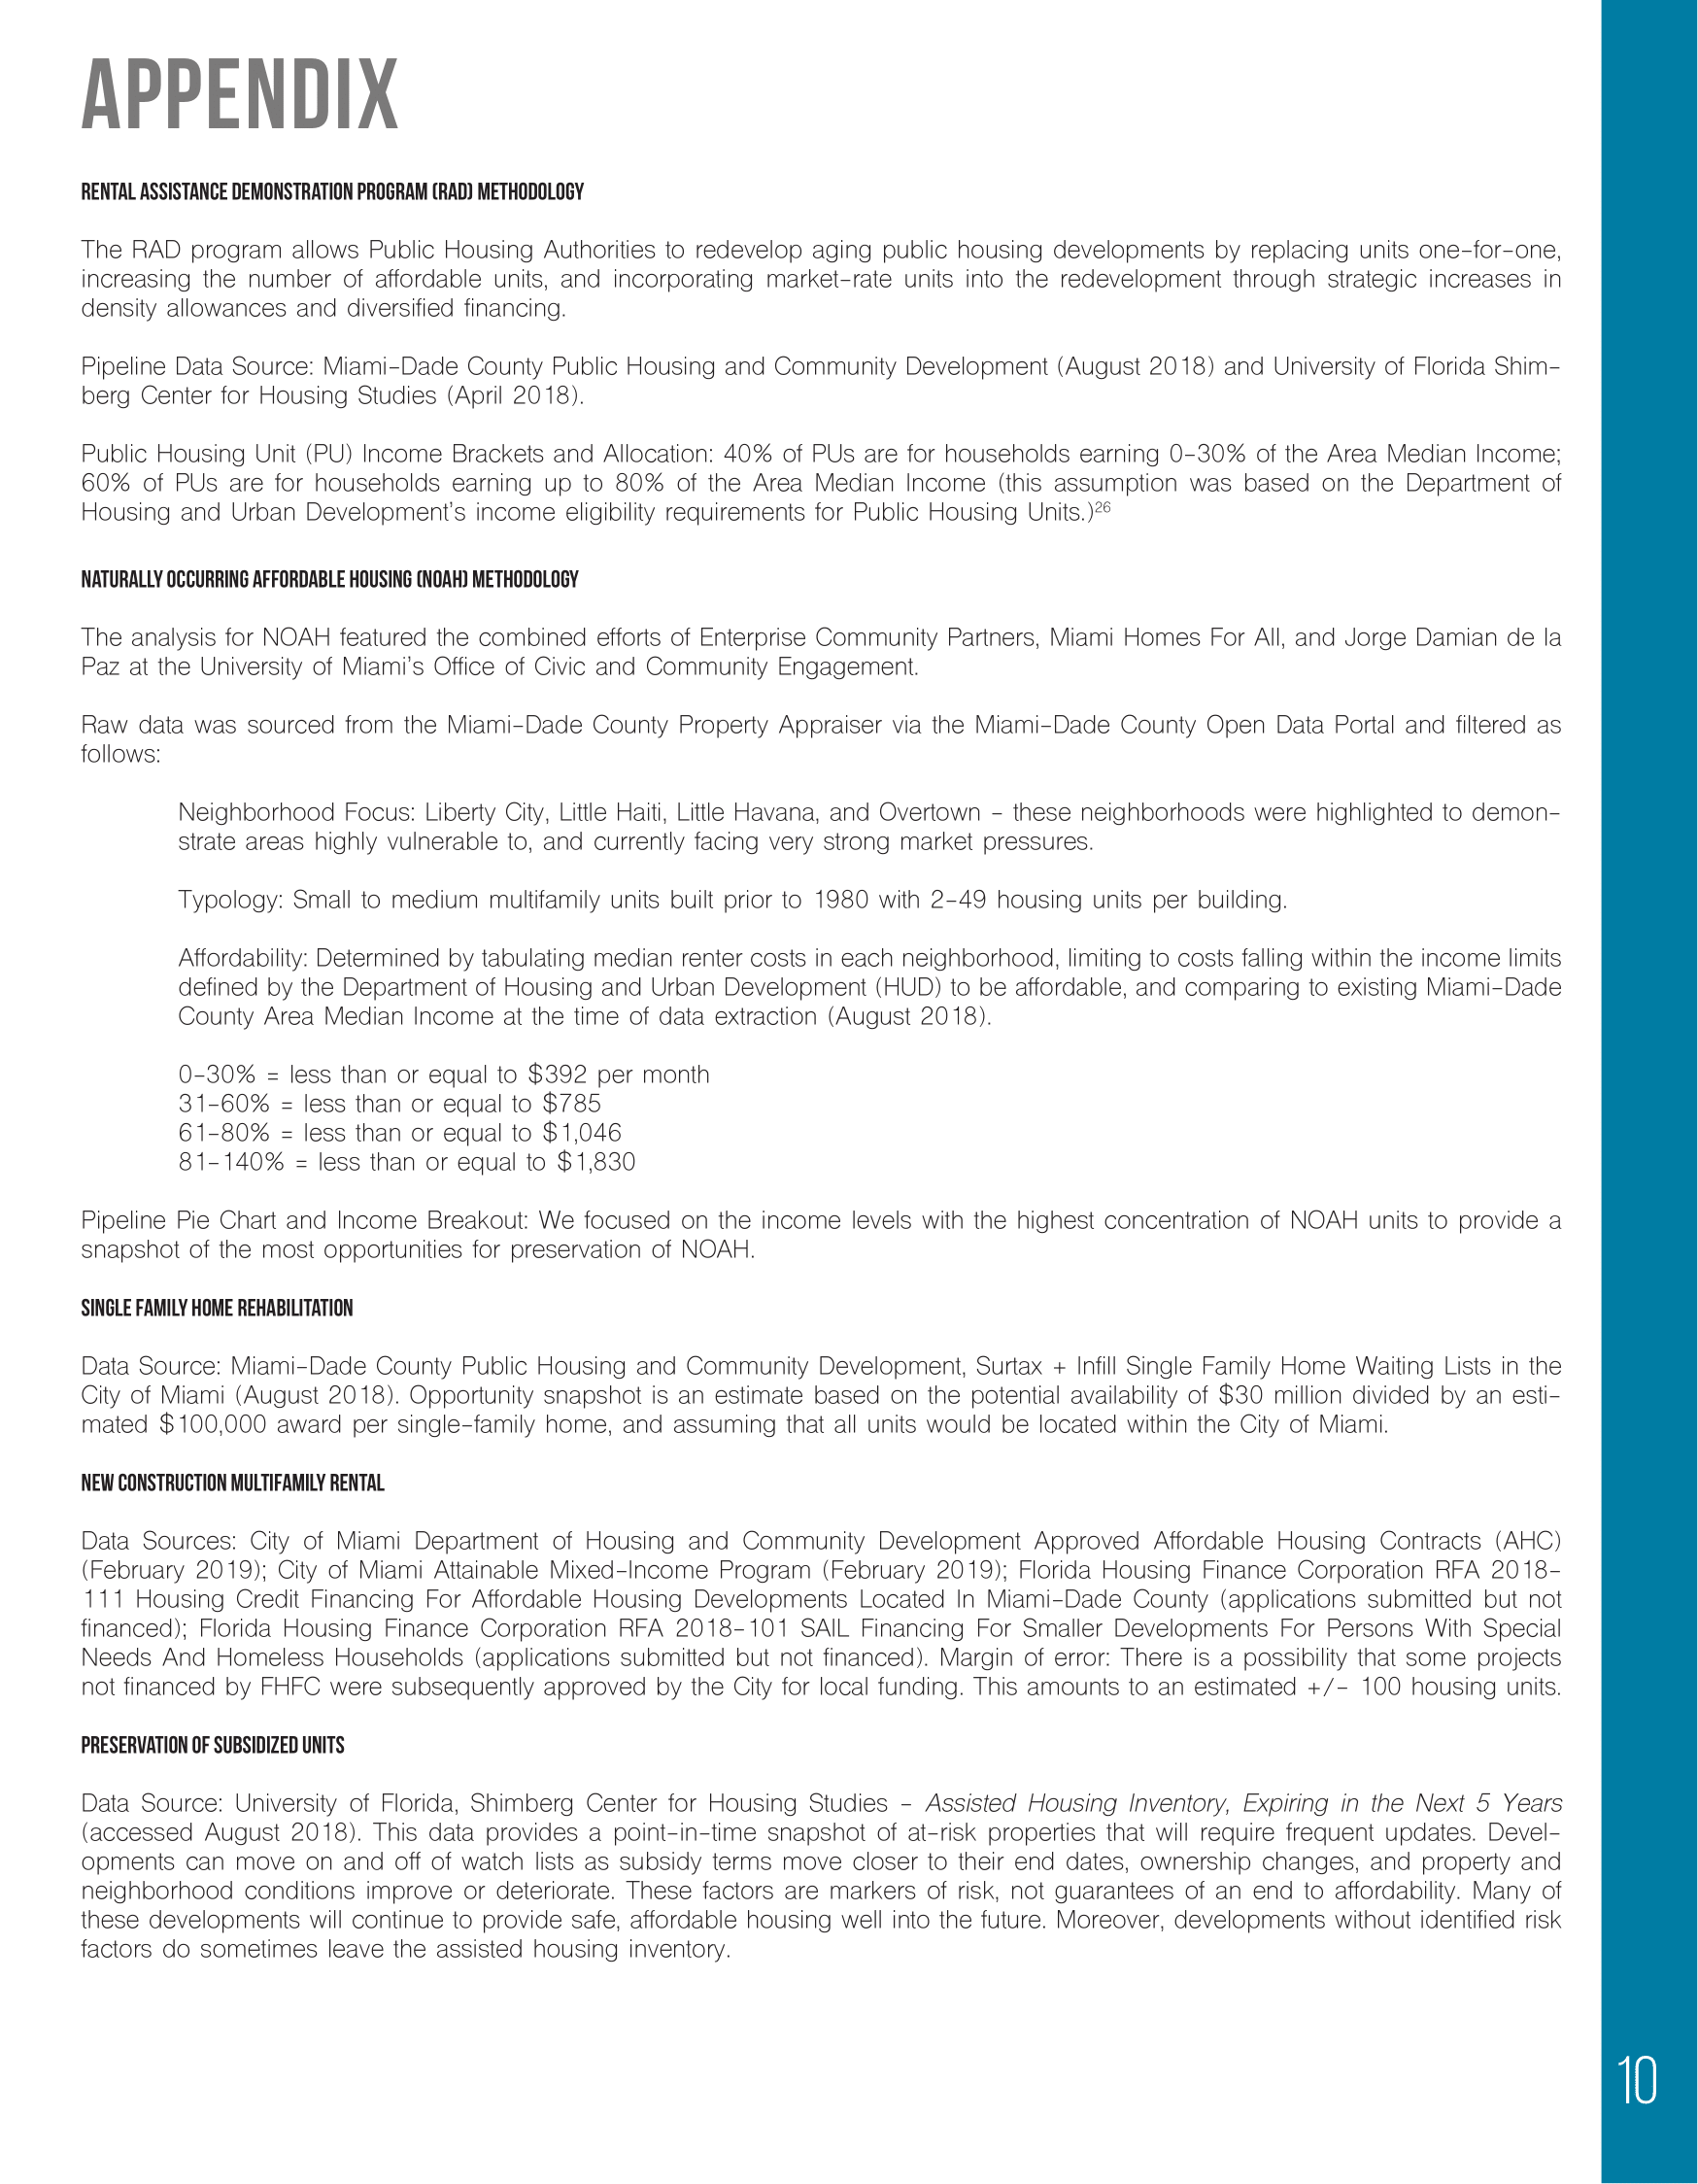 CC - Report FINAL DRAFT (5.9.2019)-11.png